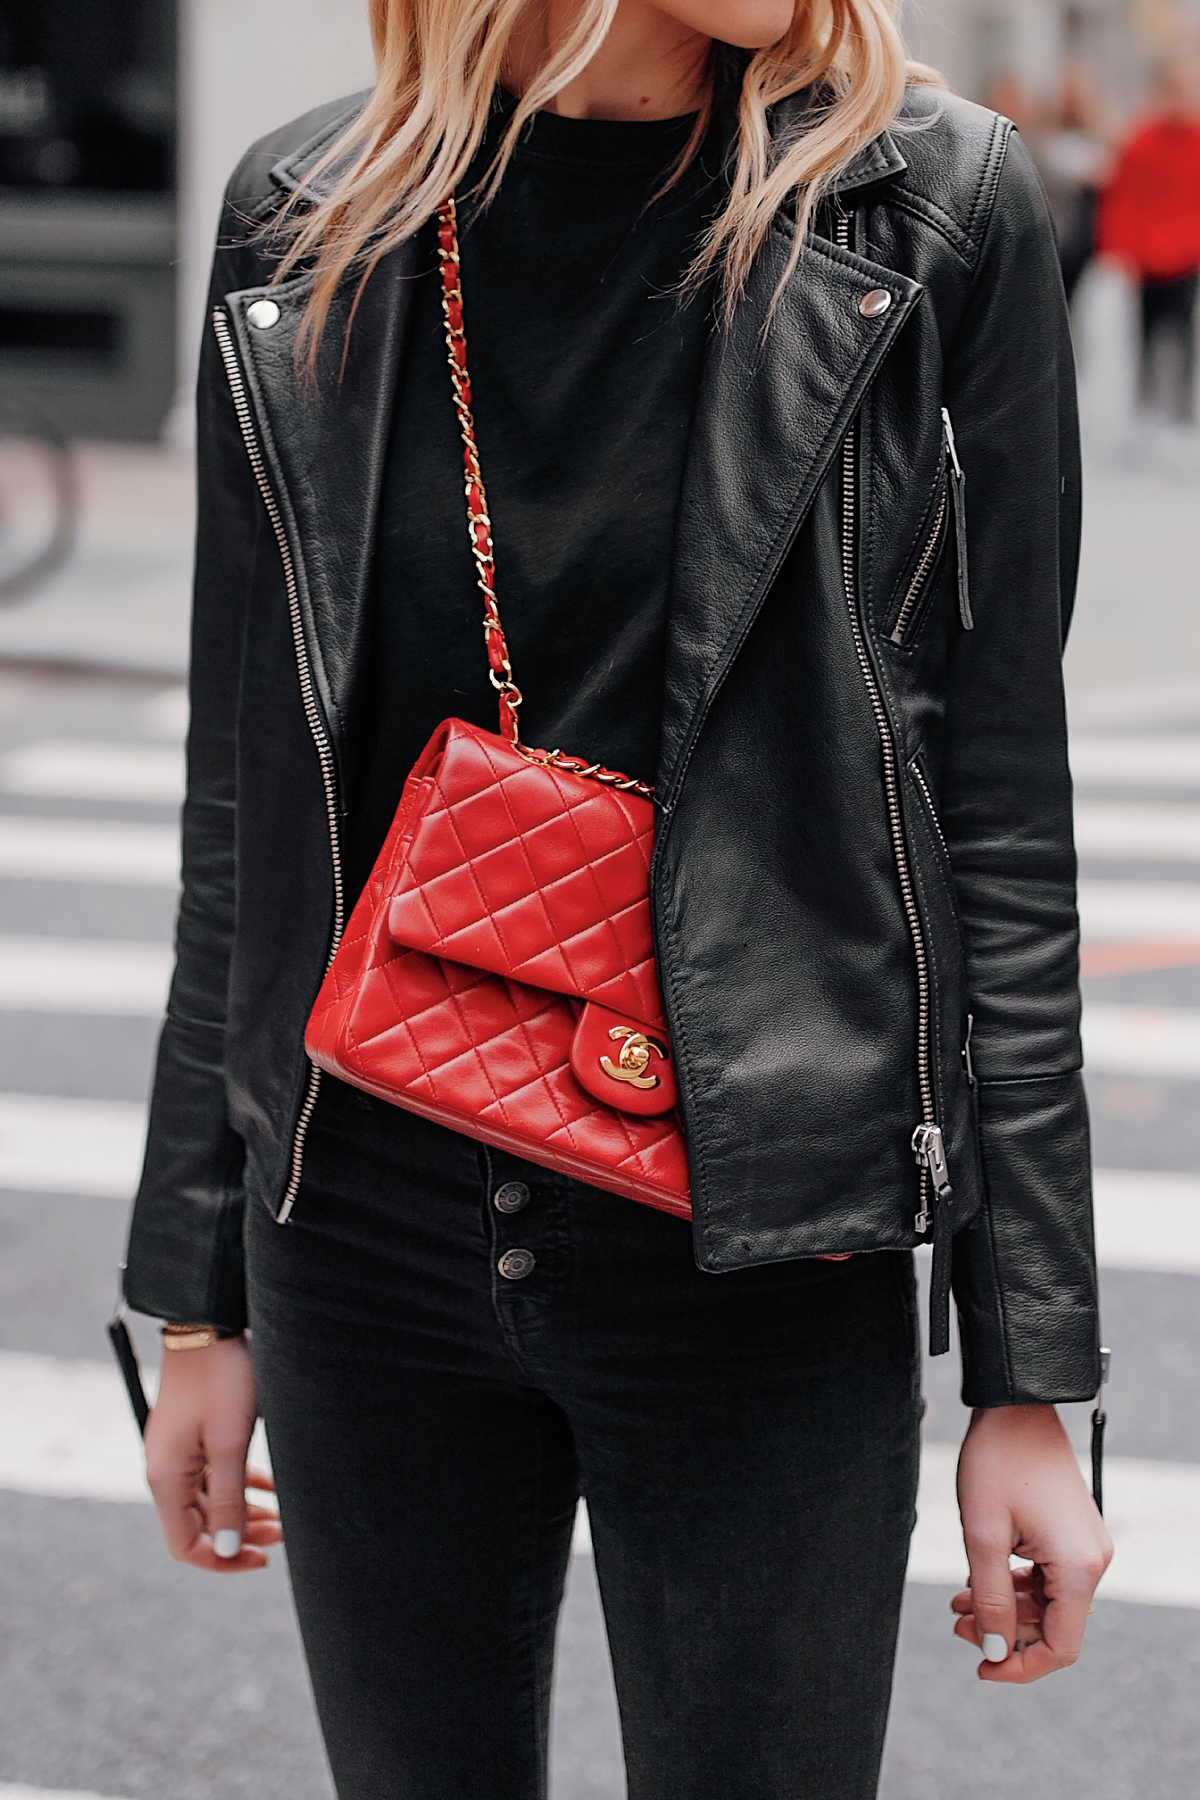 Fashion Jackson Wearing Club Monaco Black Leather Jacket Black Jeans Red Chanel Handbag